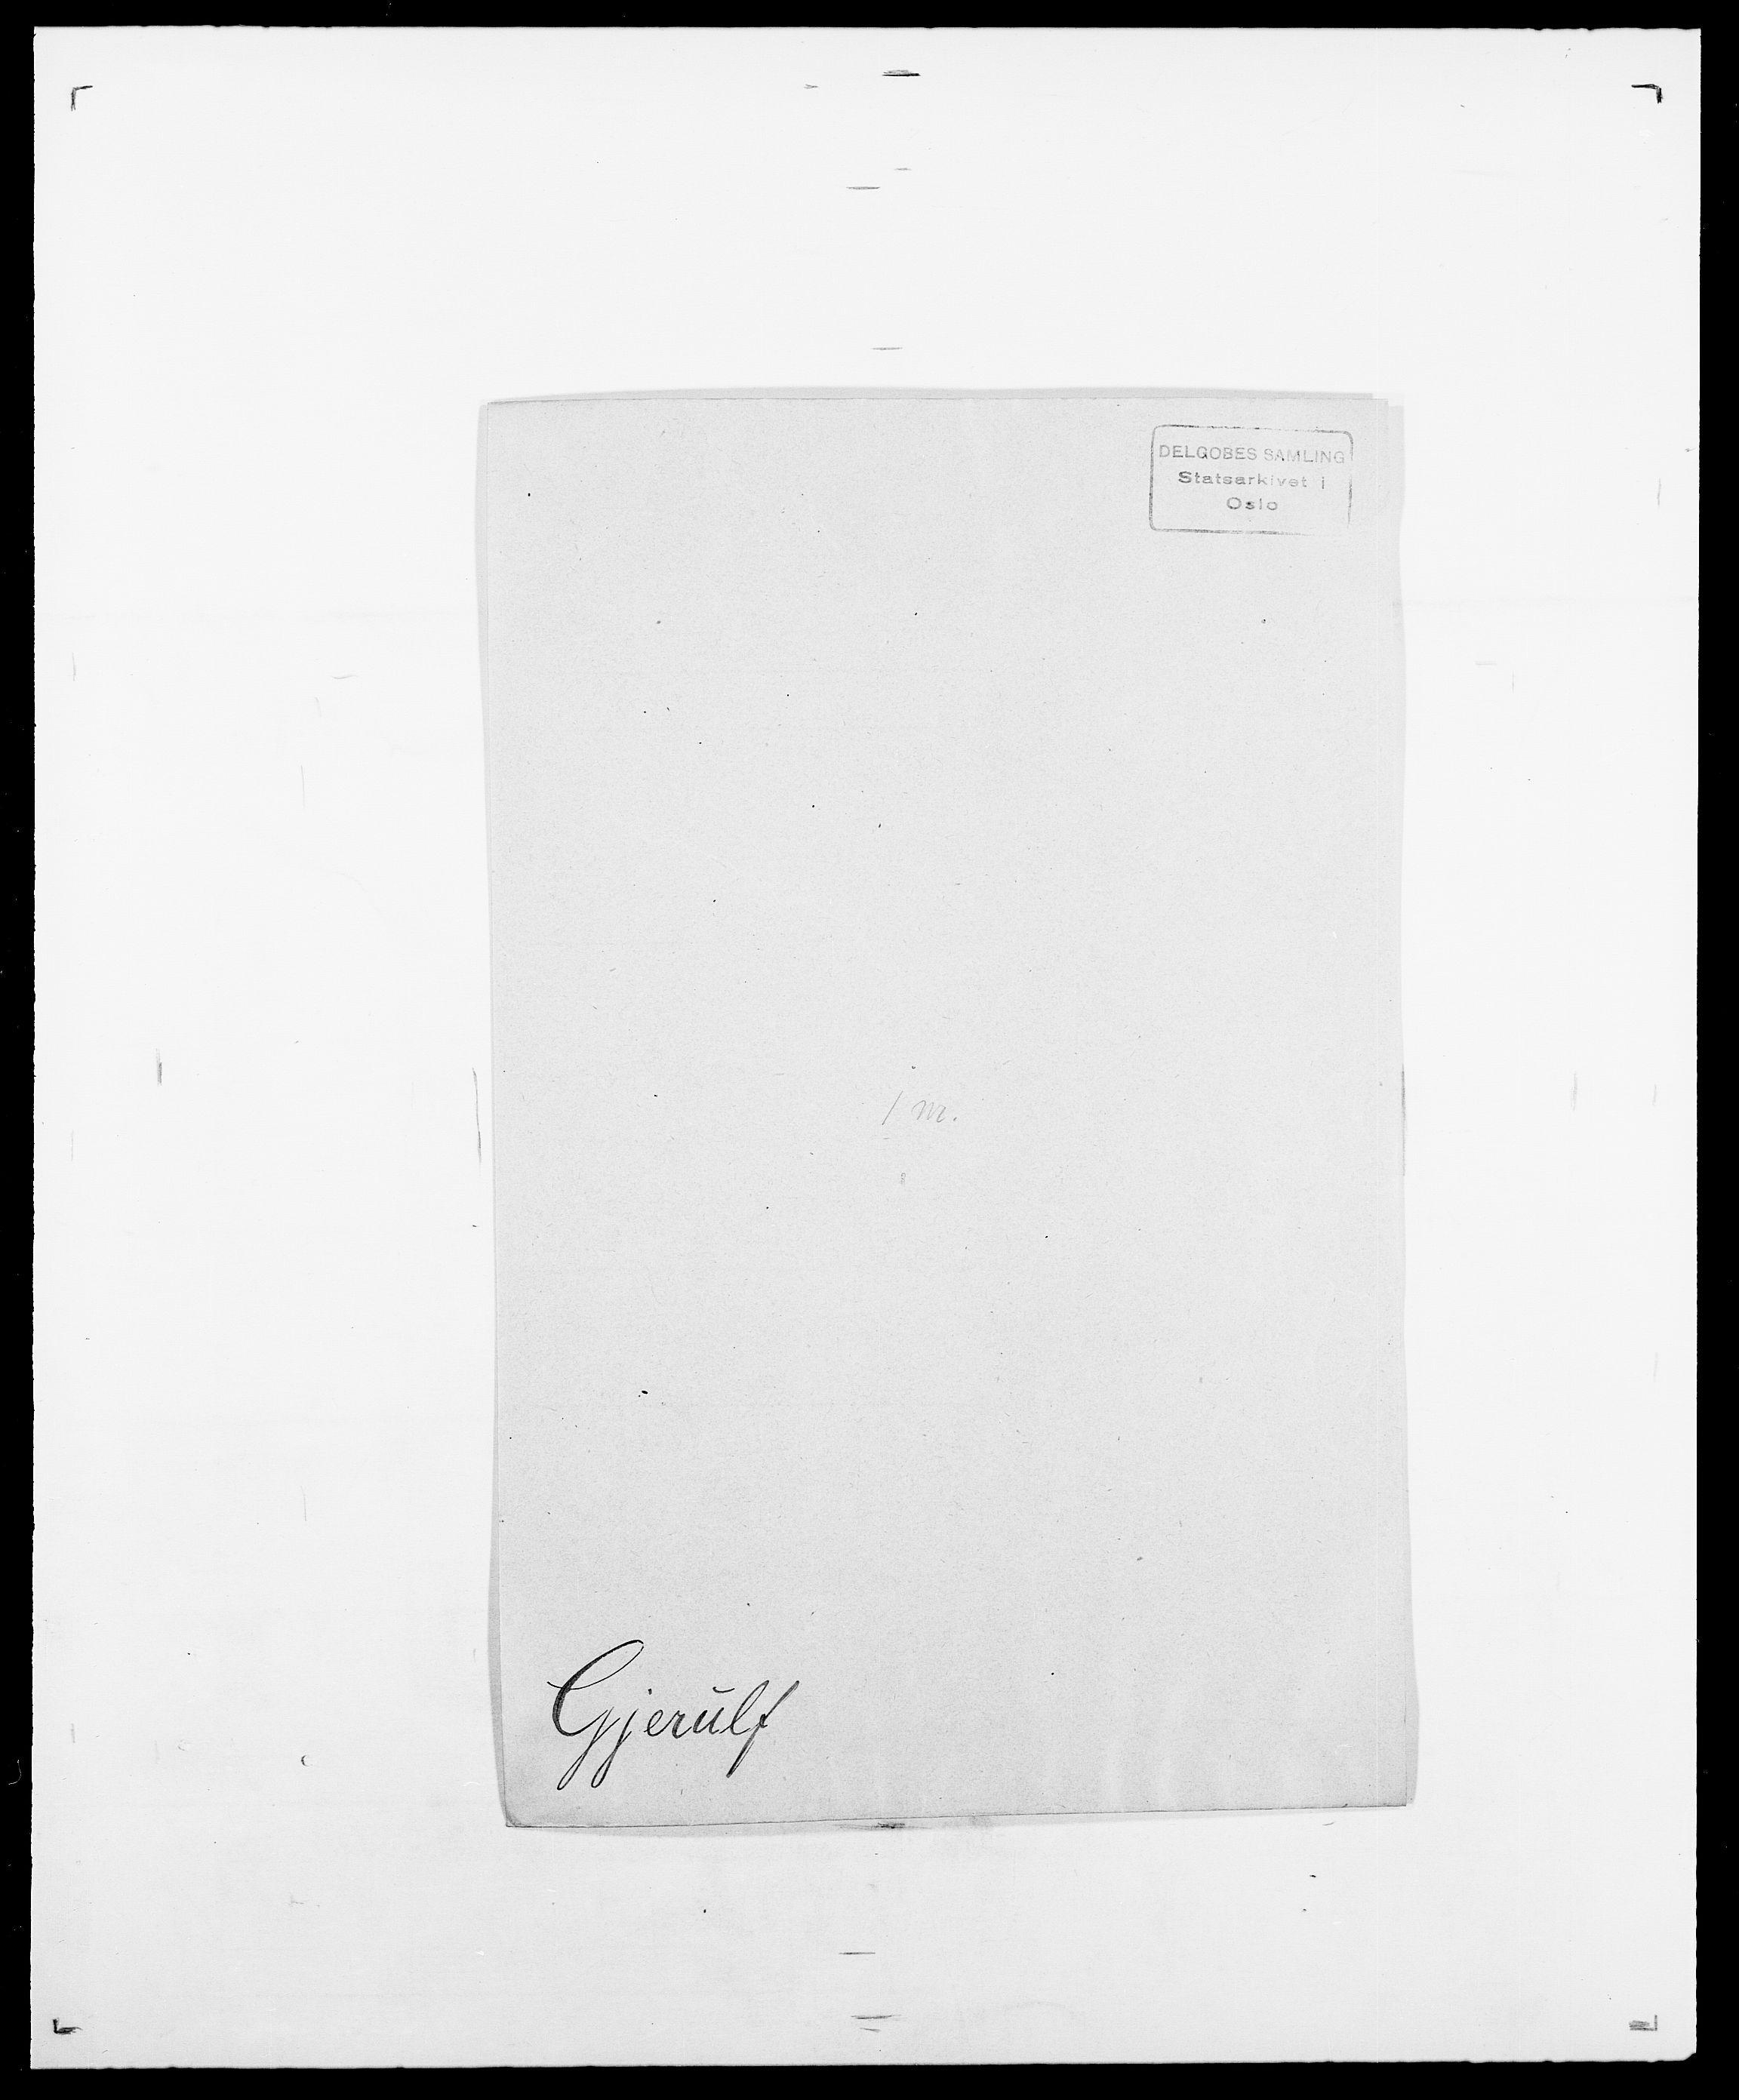 SAO, Delgobe, Charles Antoine - samling, D/Da/L0014: Giebdhausen - Grip, s. 177